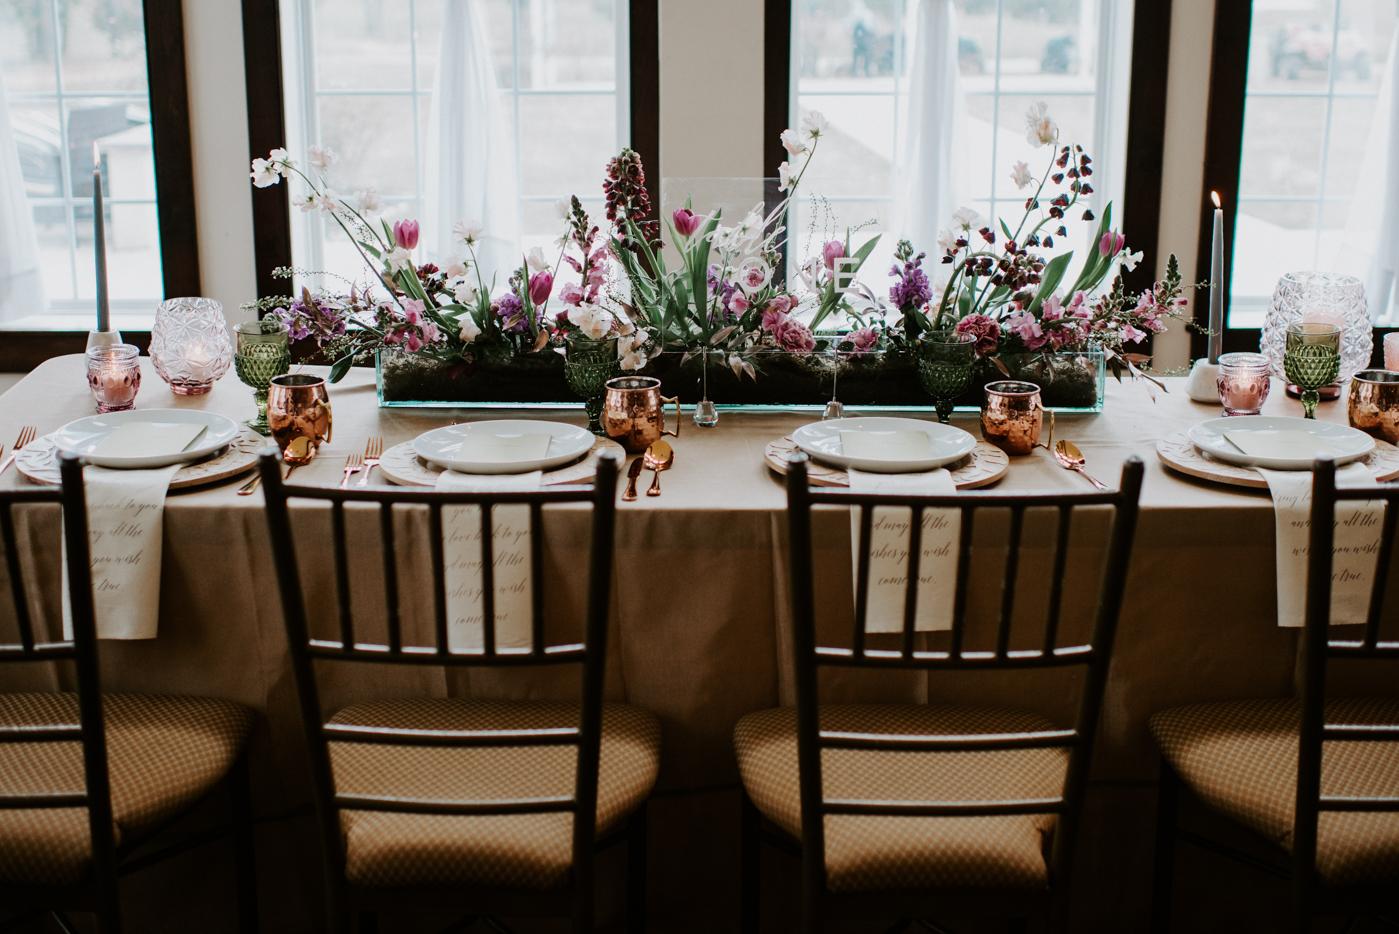 NJ Wedding, Centerpiece, Spraying Centerpiece, Rectangle Table, House of Catherine, Samantha Jay Photography